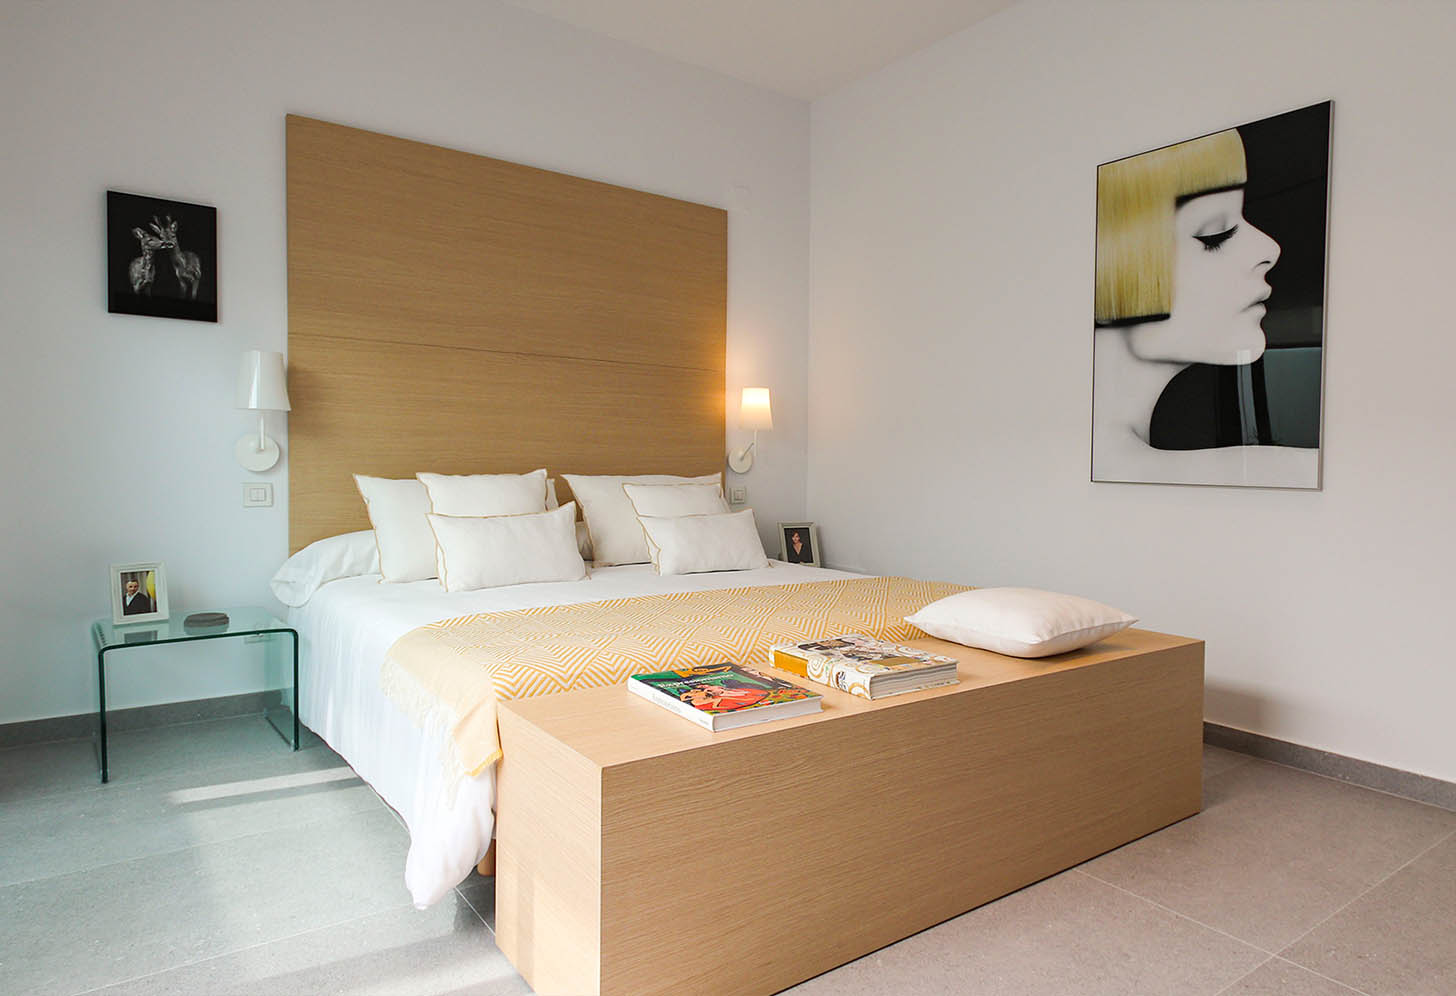 immobilier neuf espagne costa blanca on-3b essence duplex chambre 2